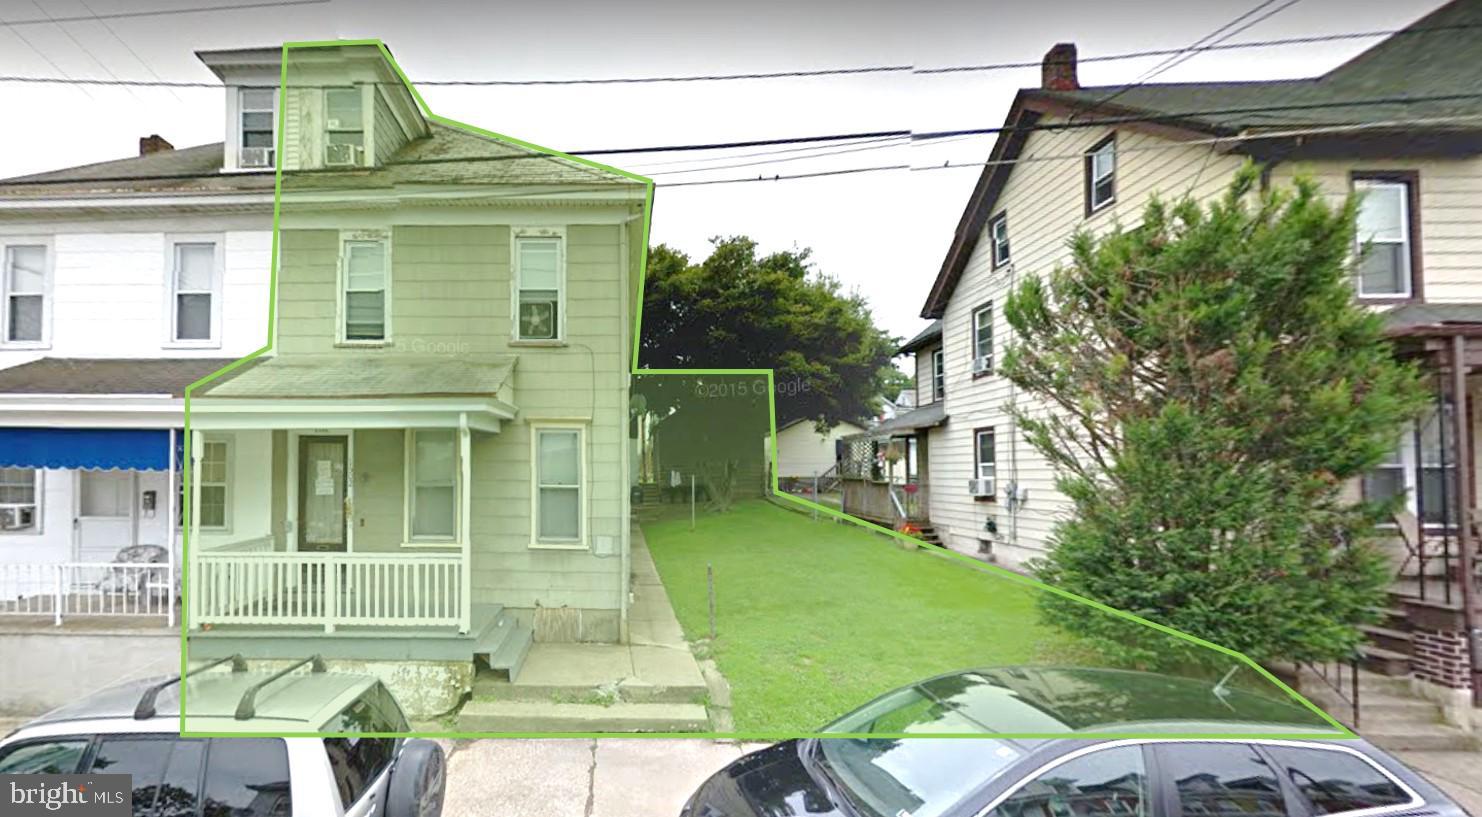 1502 LEHIGH STREET, EASTON, PA 18042